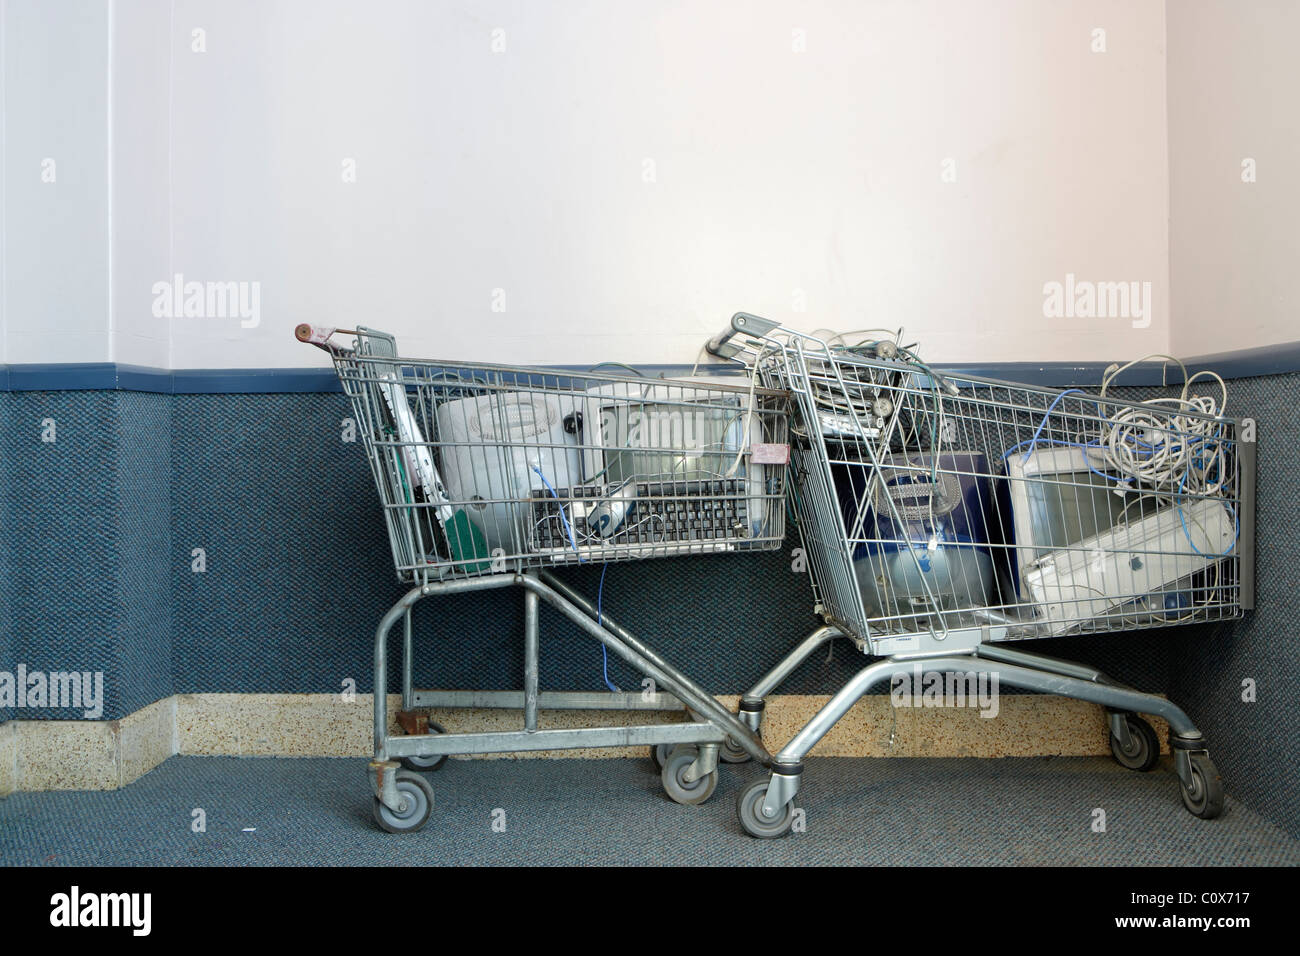 Old computers in shopping trolleys in school corridor. - Stock Image